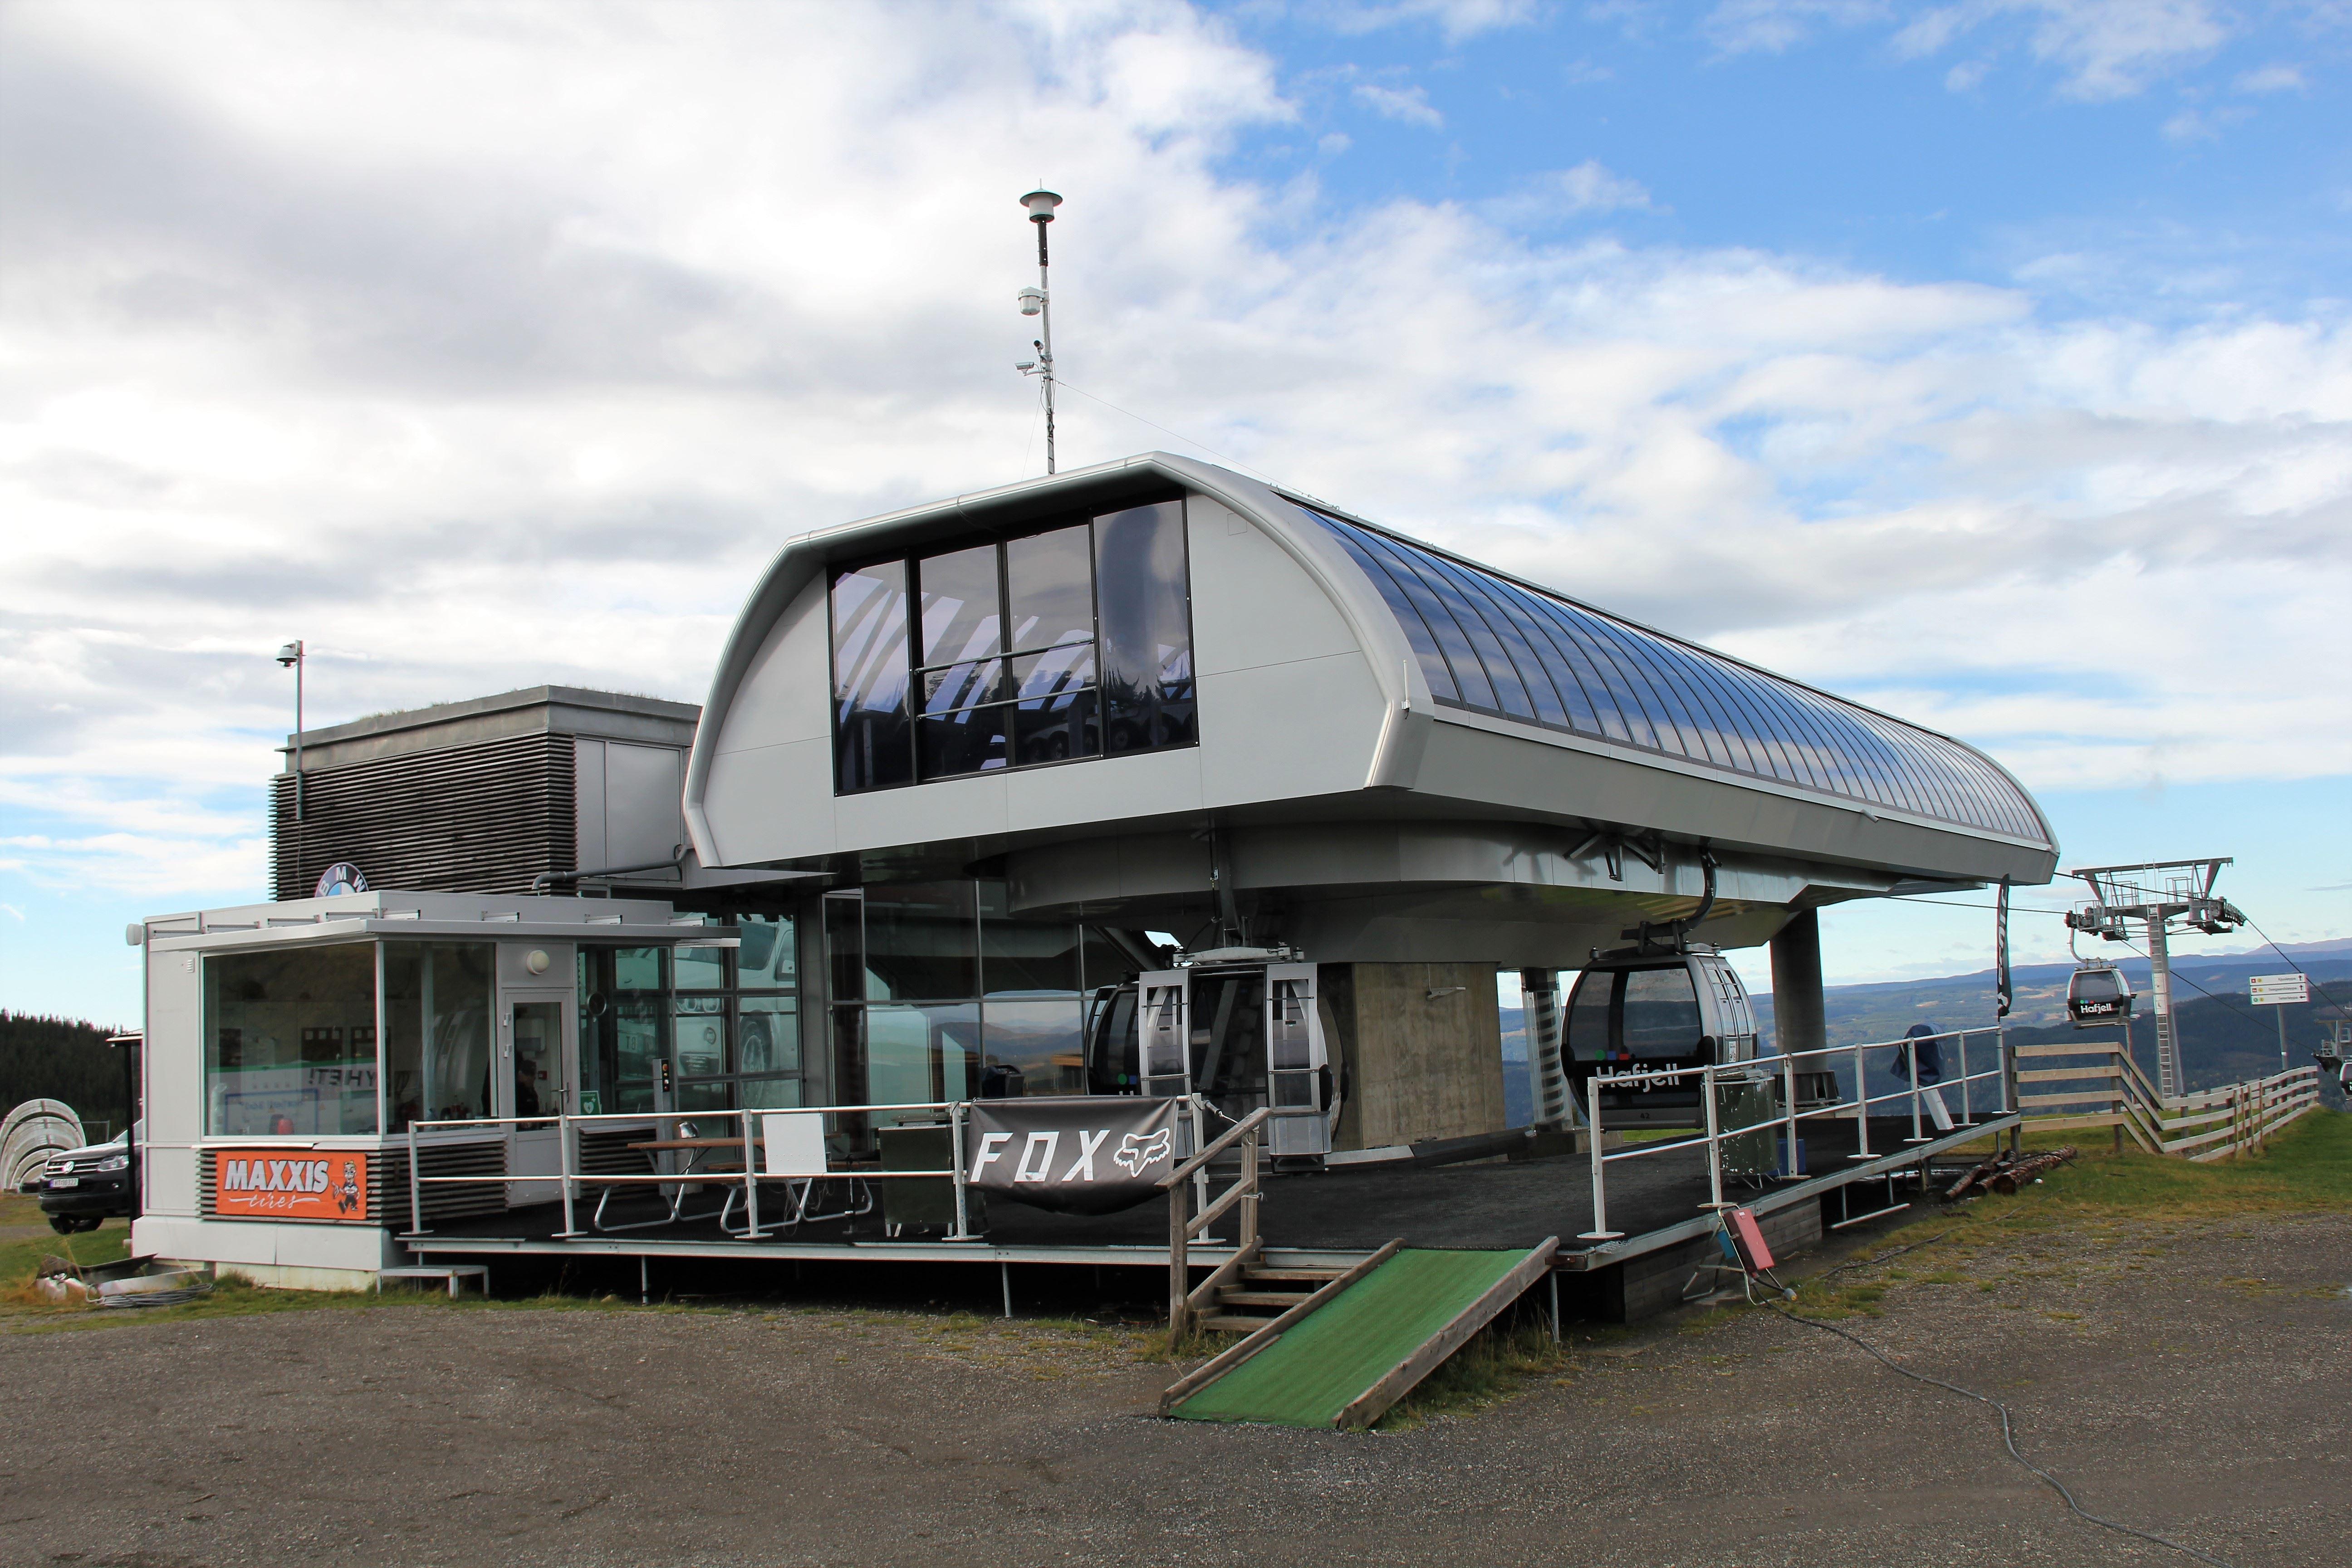 Gondolen i Hafjell